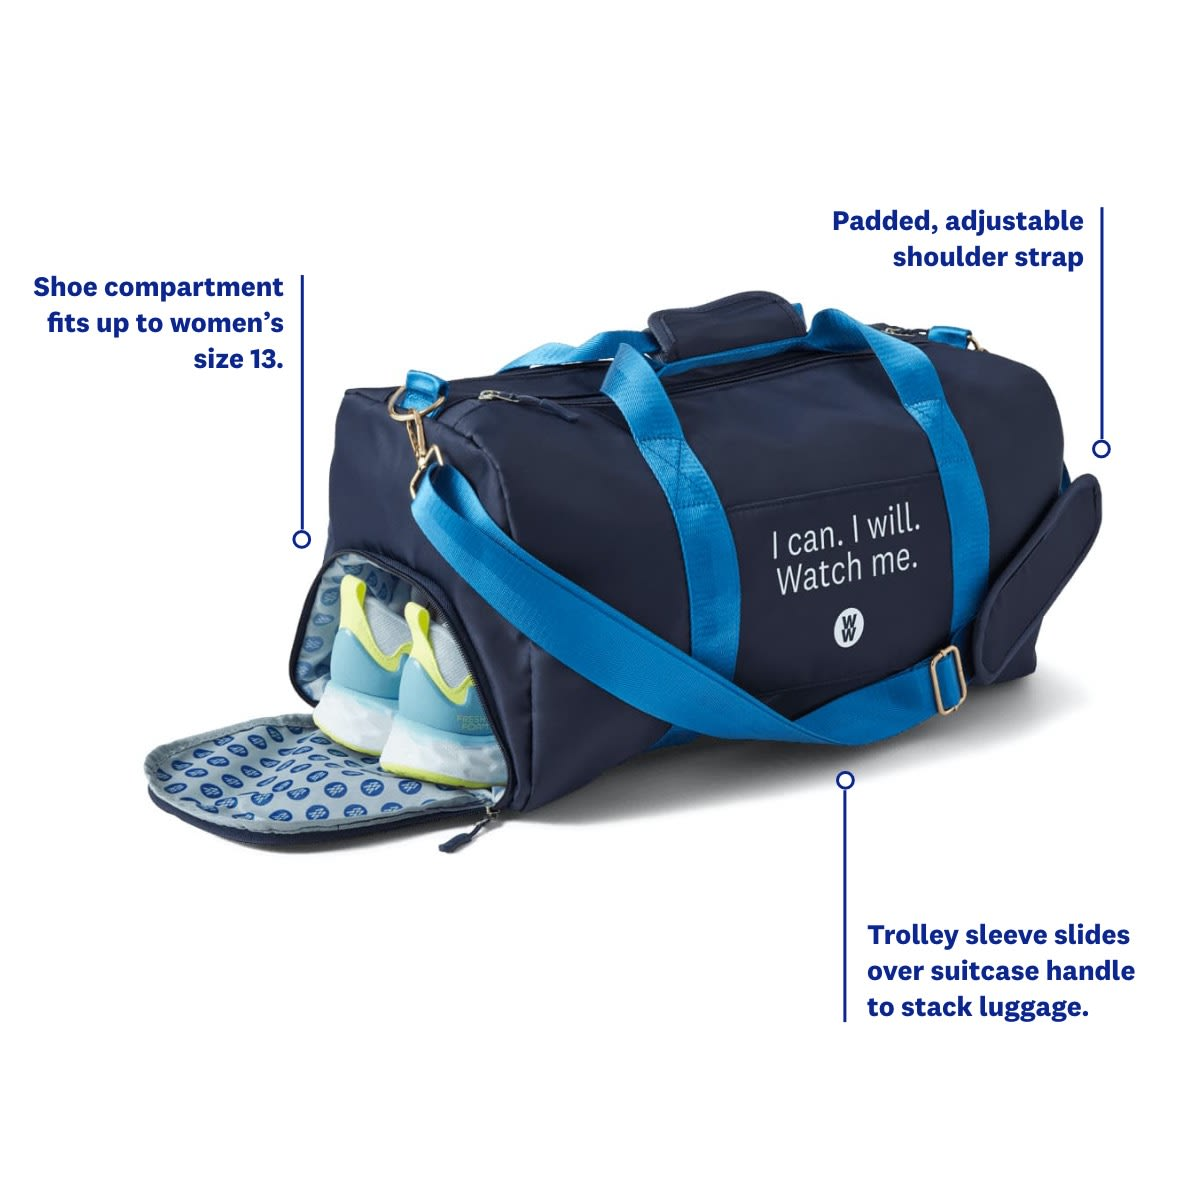 I can I will Watch Me Gym Bag - WW Gym Bag - infographic 1